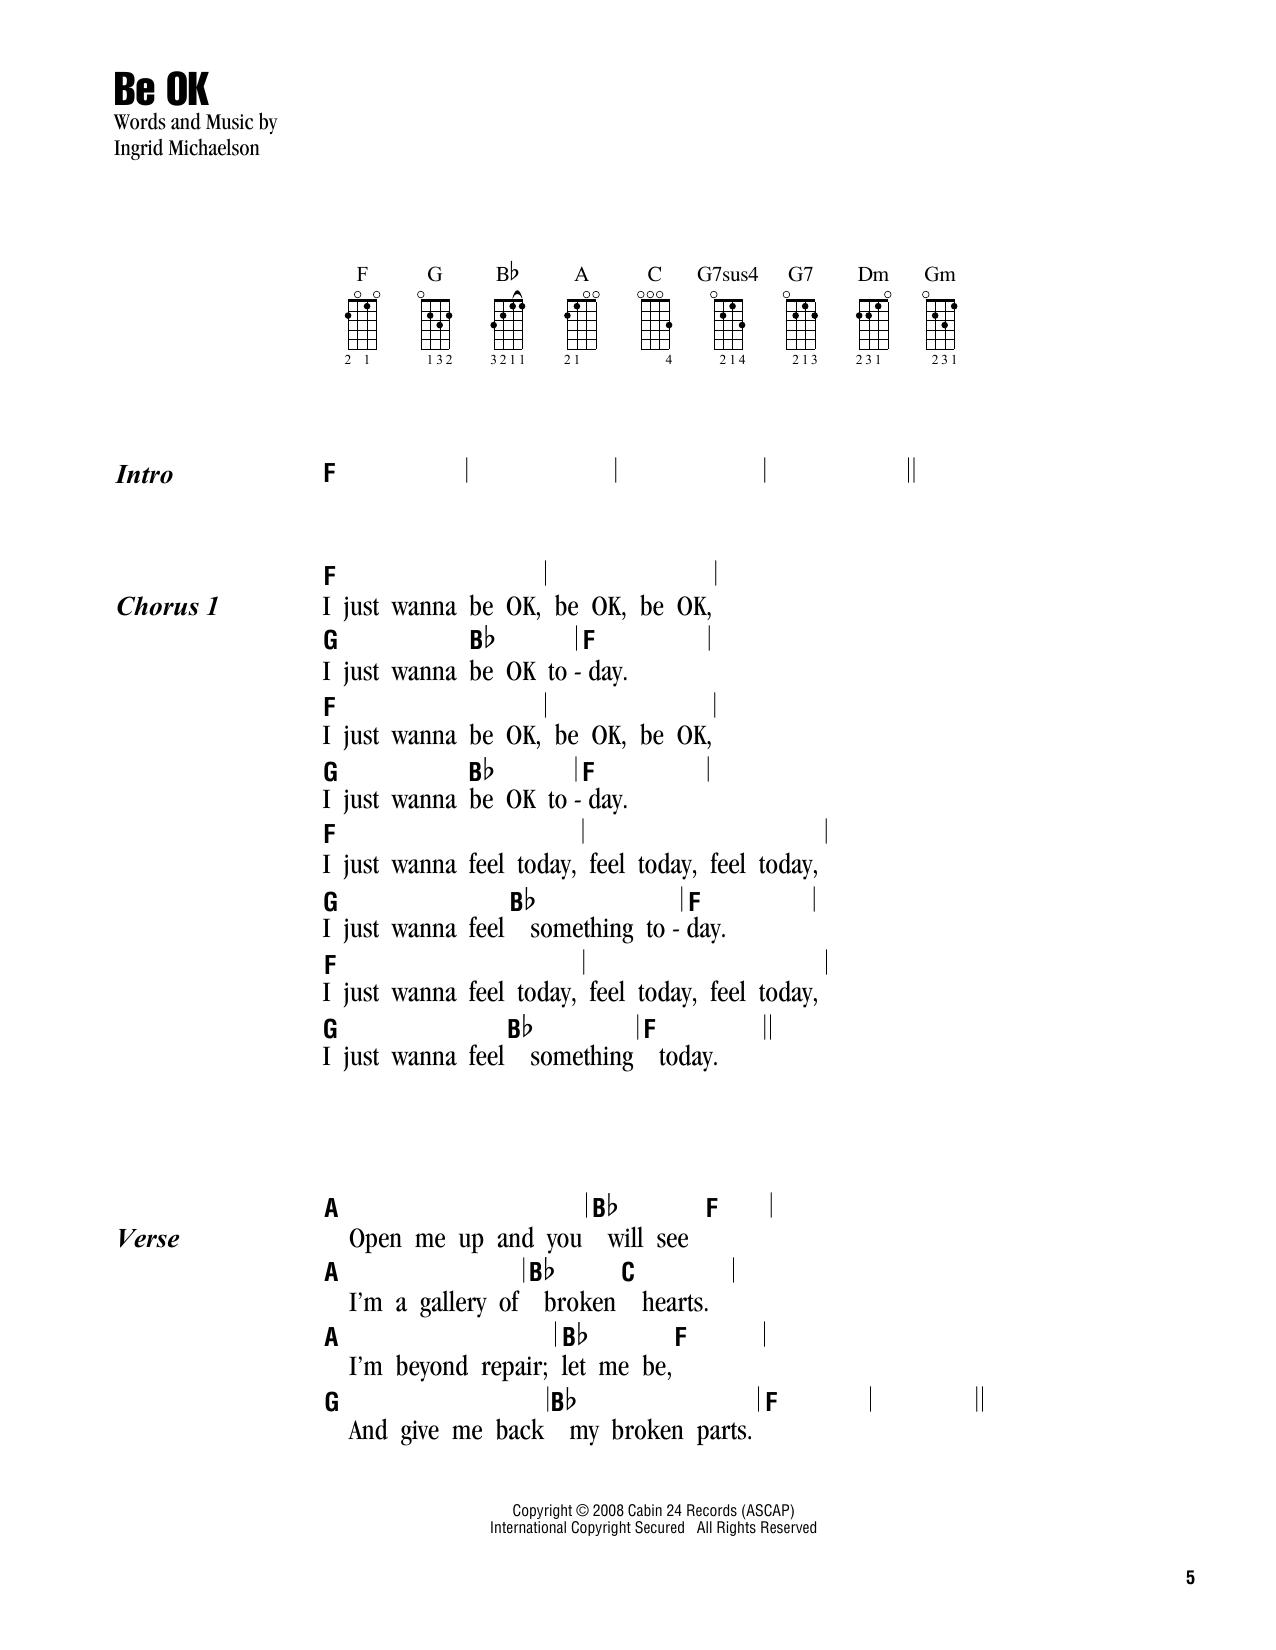 Be OK sheet music by Ingrid Michaelson (Ukulele with strumming patterns u2013 163101)